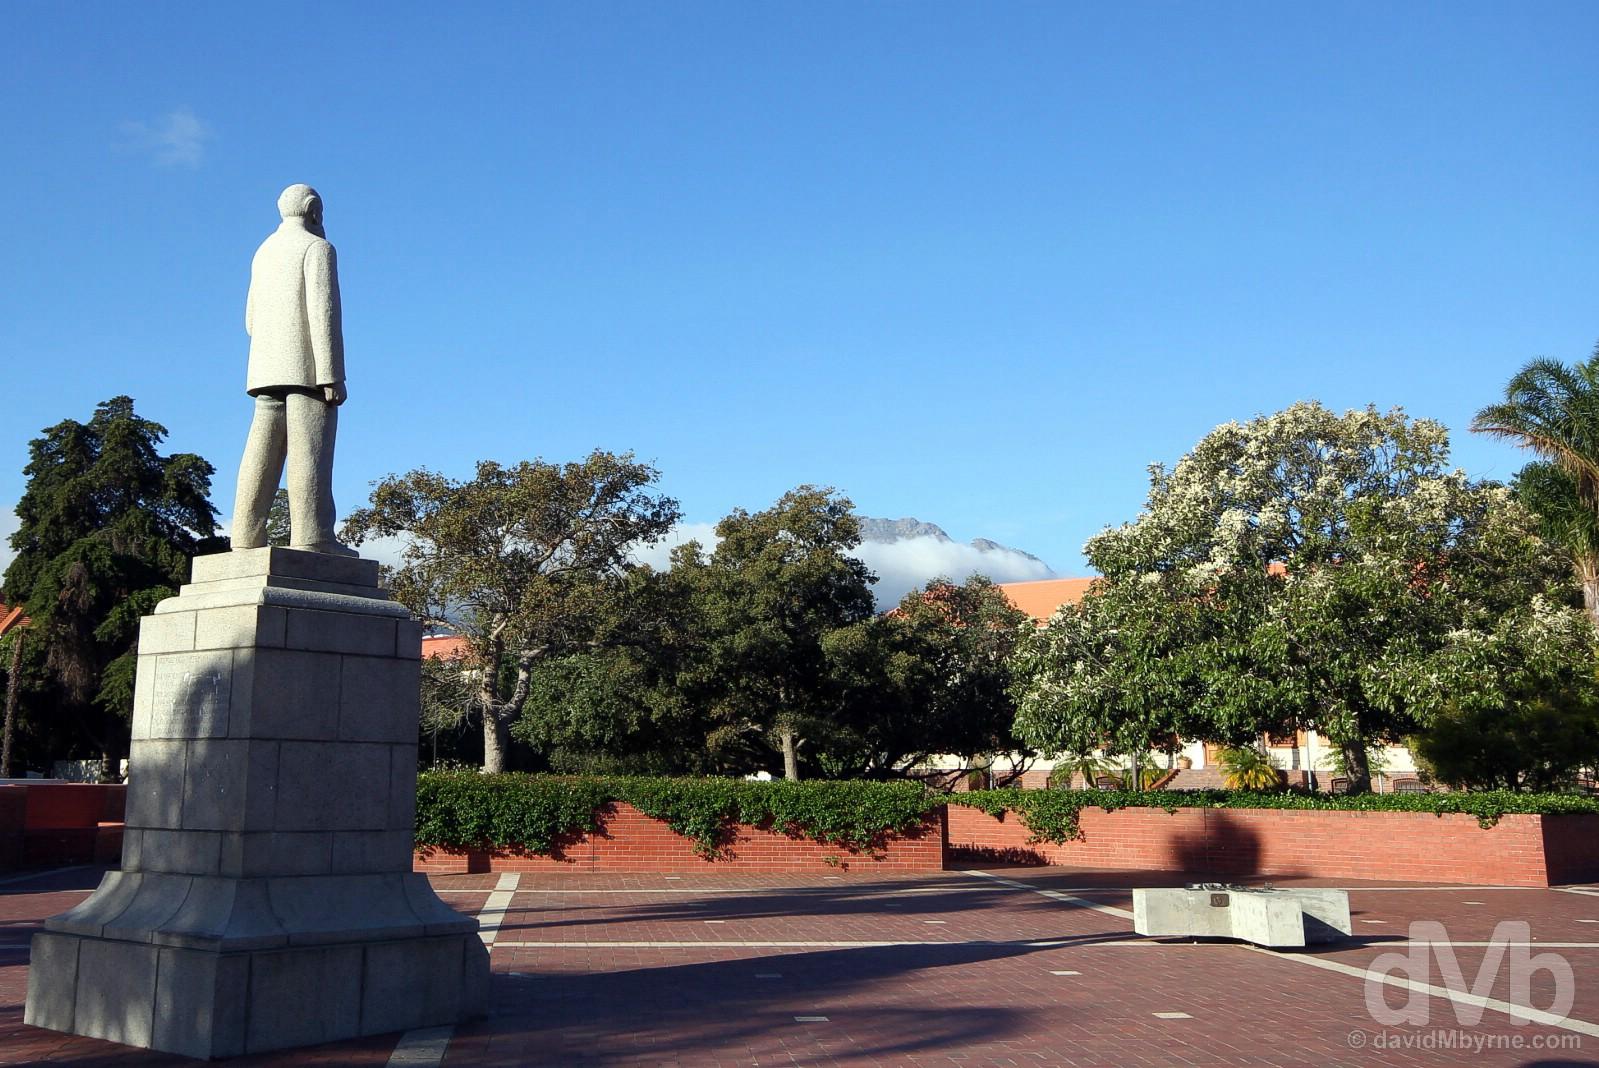 On the campus of Stellenbosch University, Stellenbosch, Western Cape, South Africa. February 18, 2017.